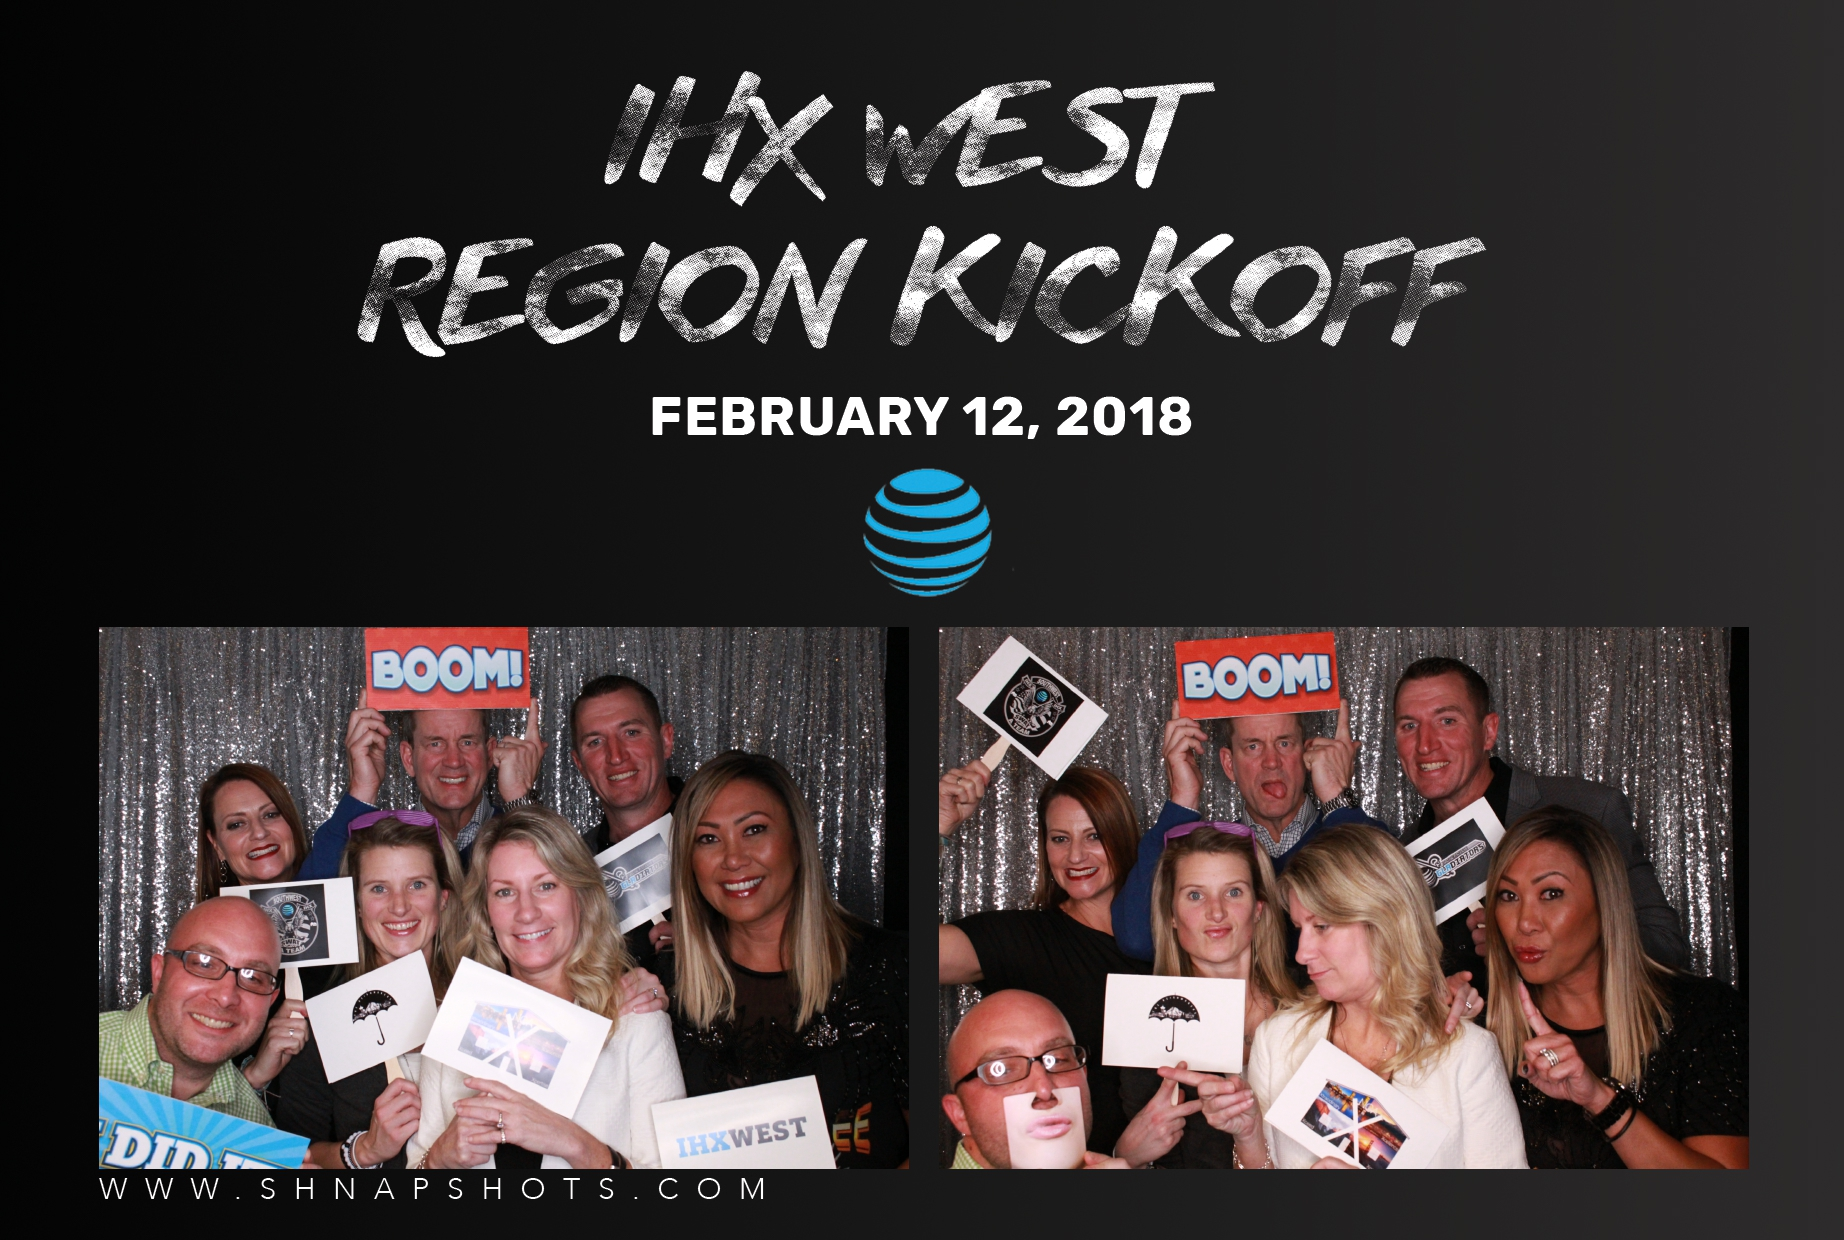 AT&T West Region Kickoff